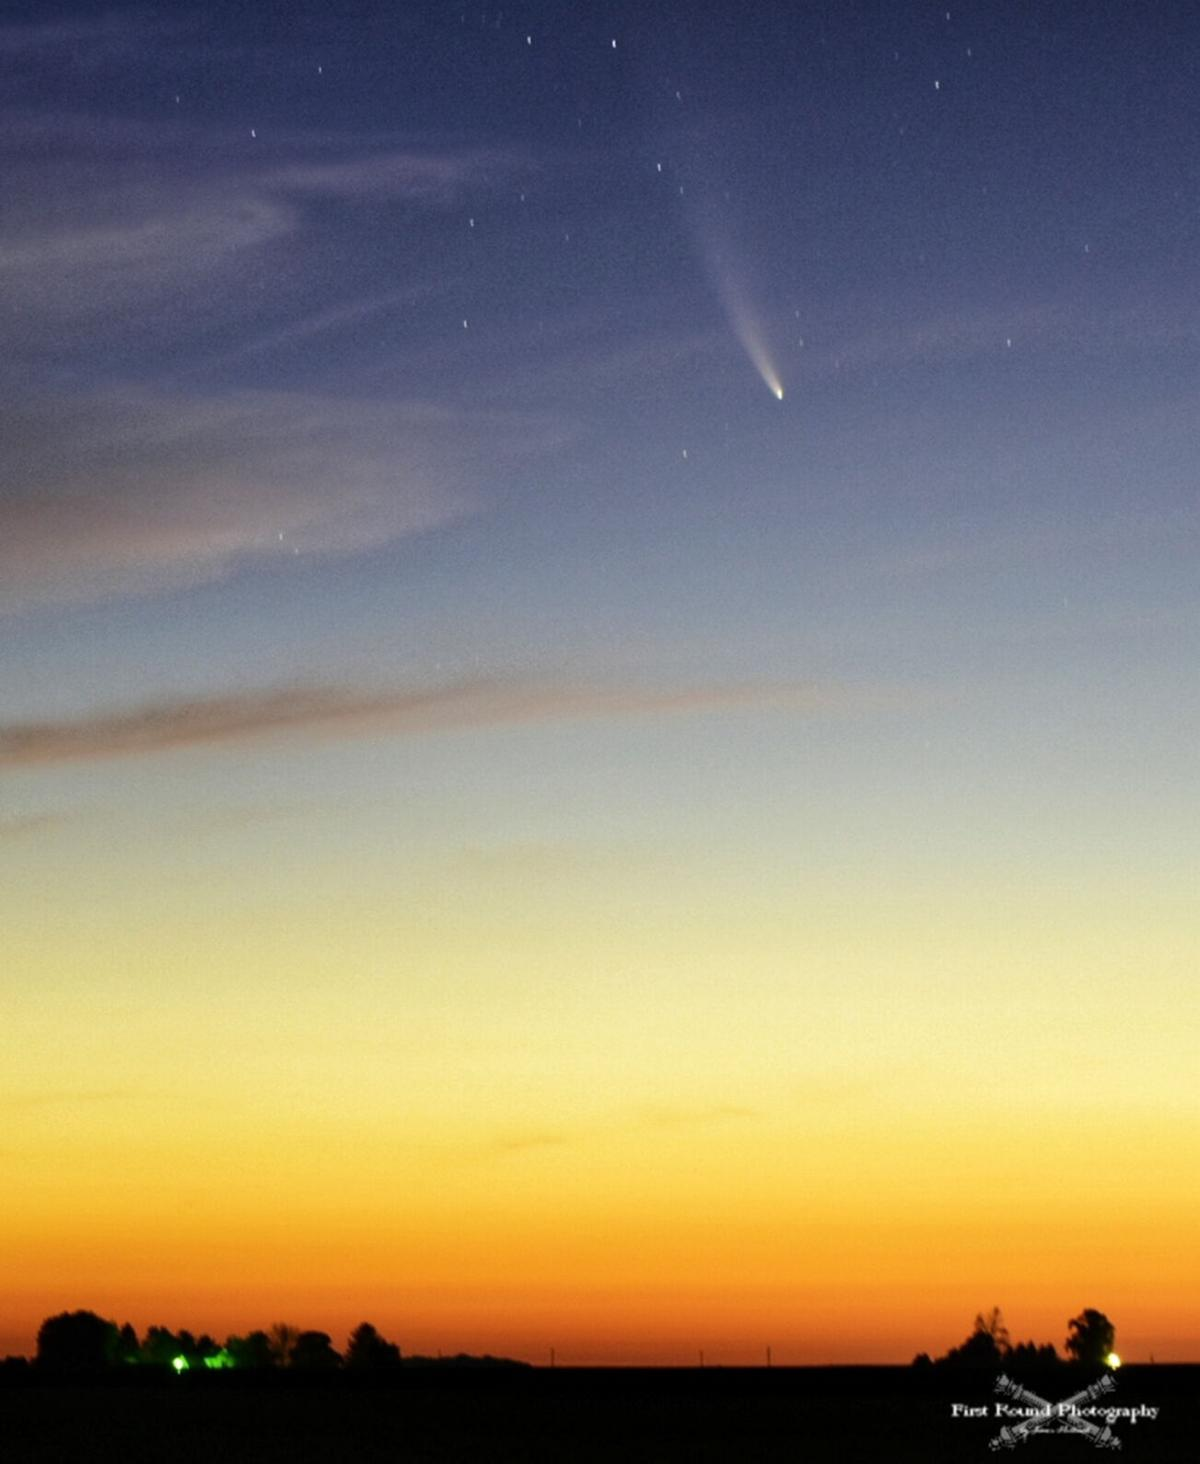 NEOWISE4.jpg